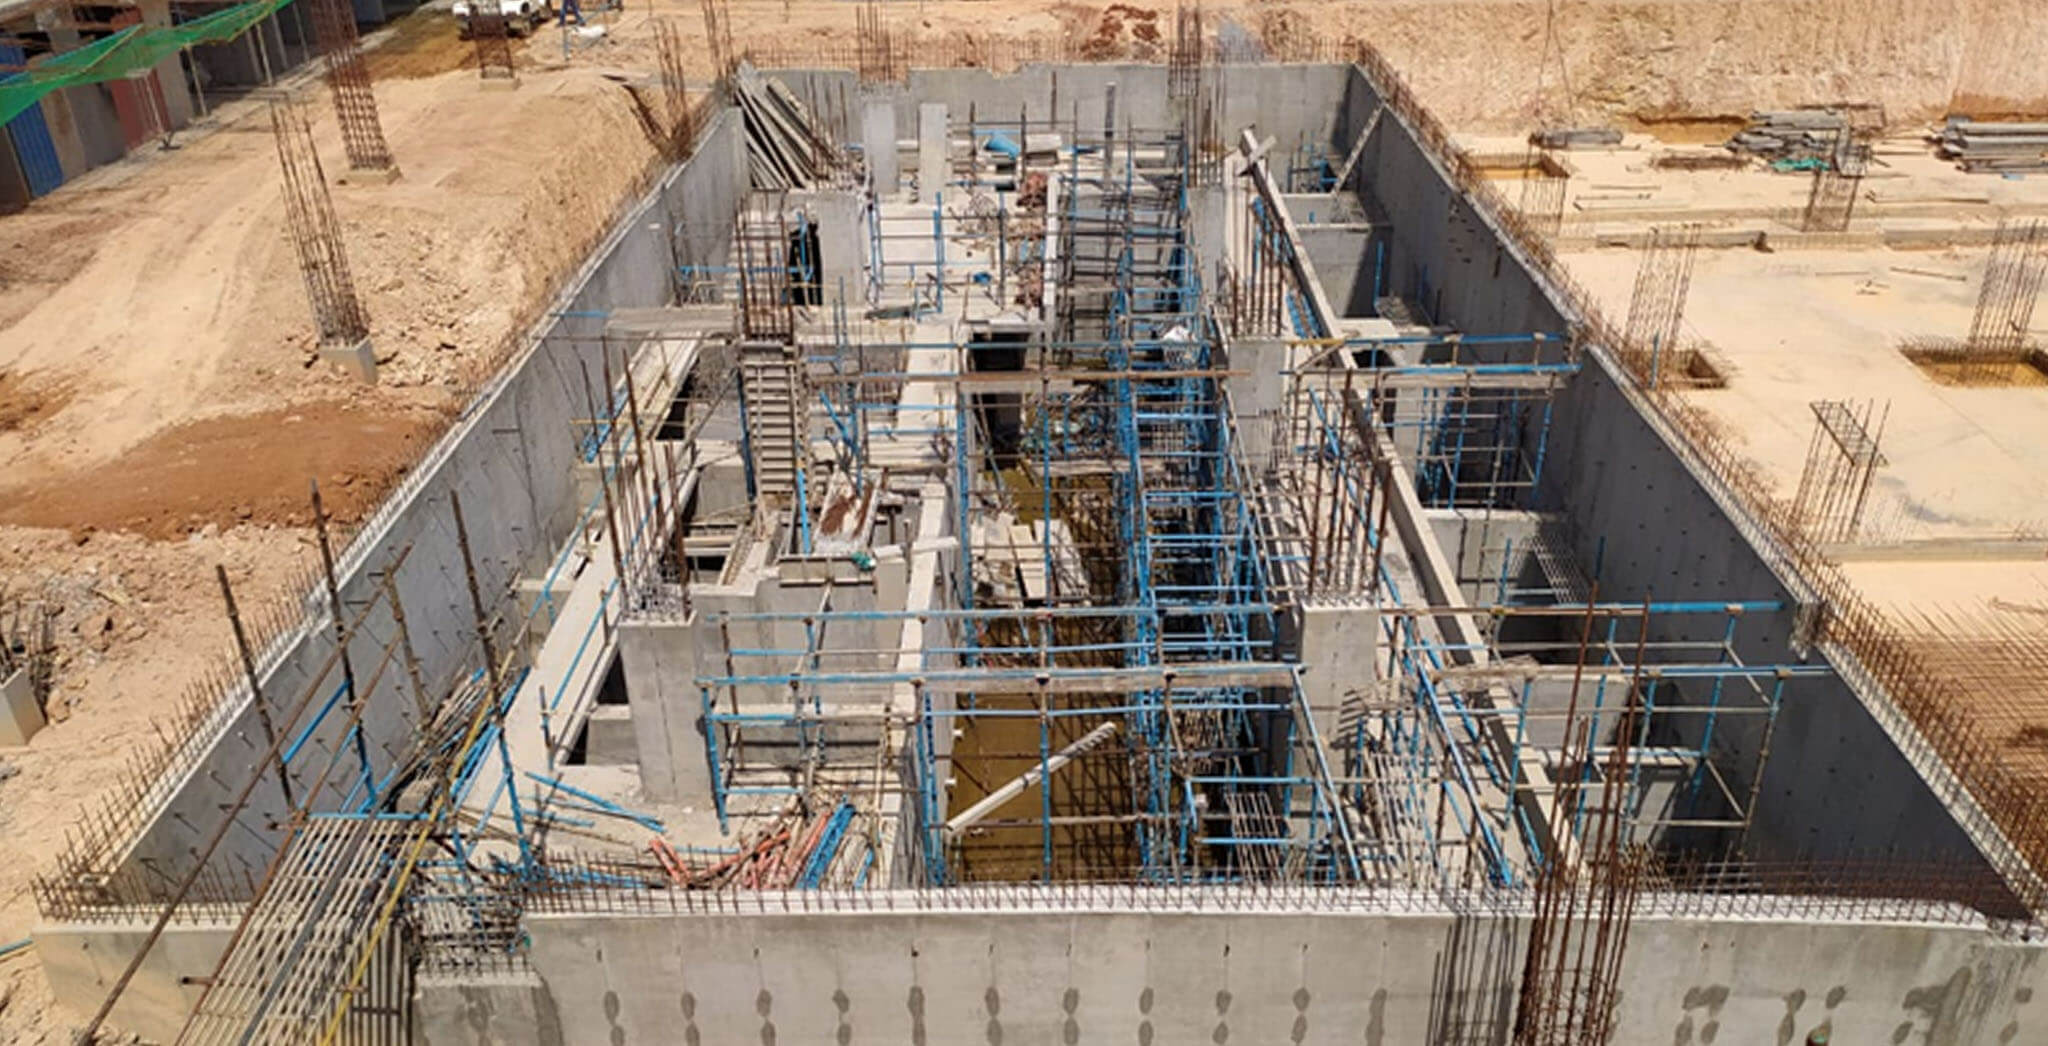 Sewage Treatment Plant - Status Image 4